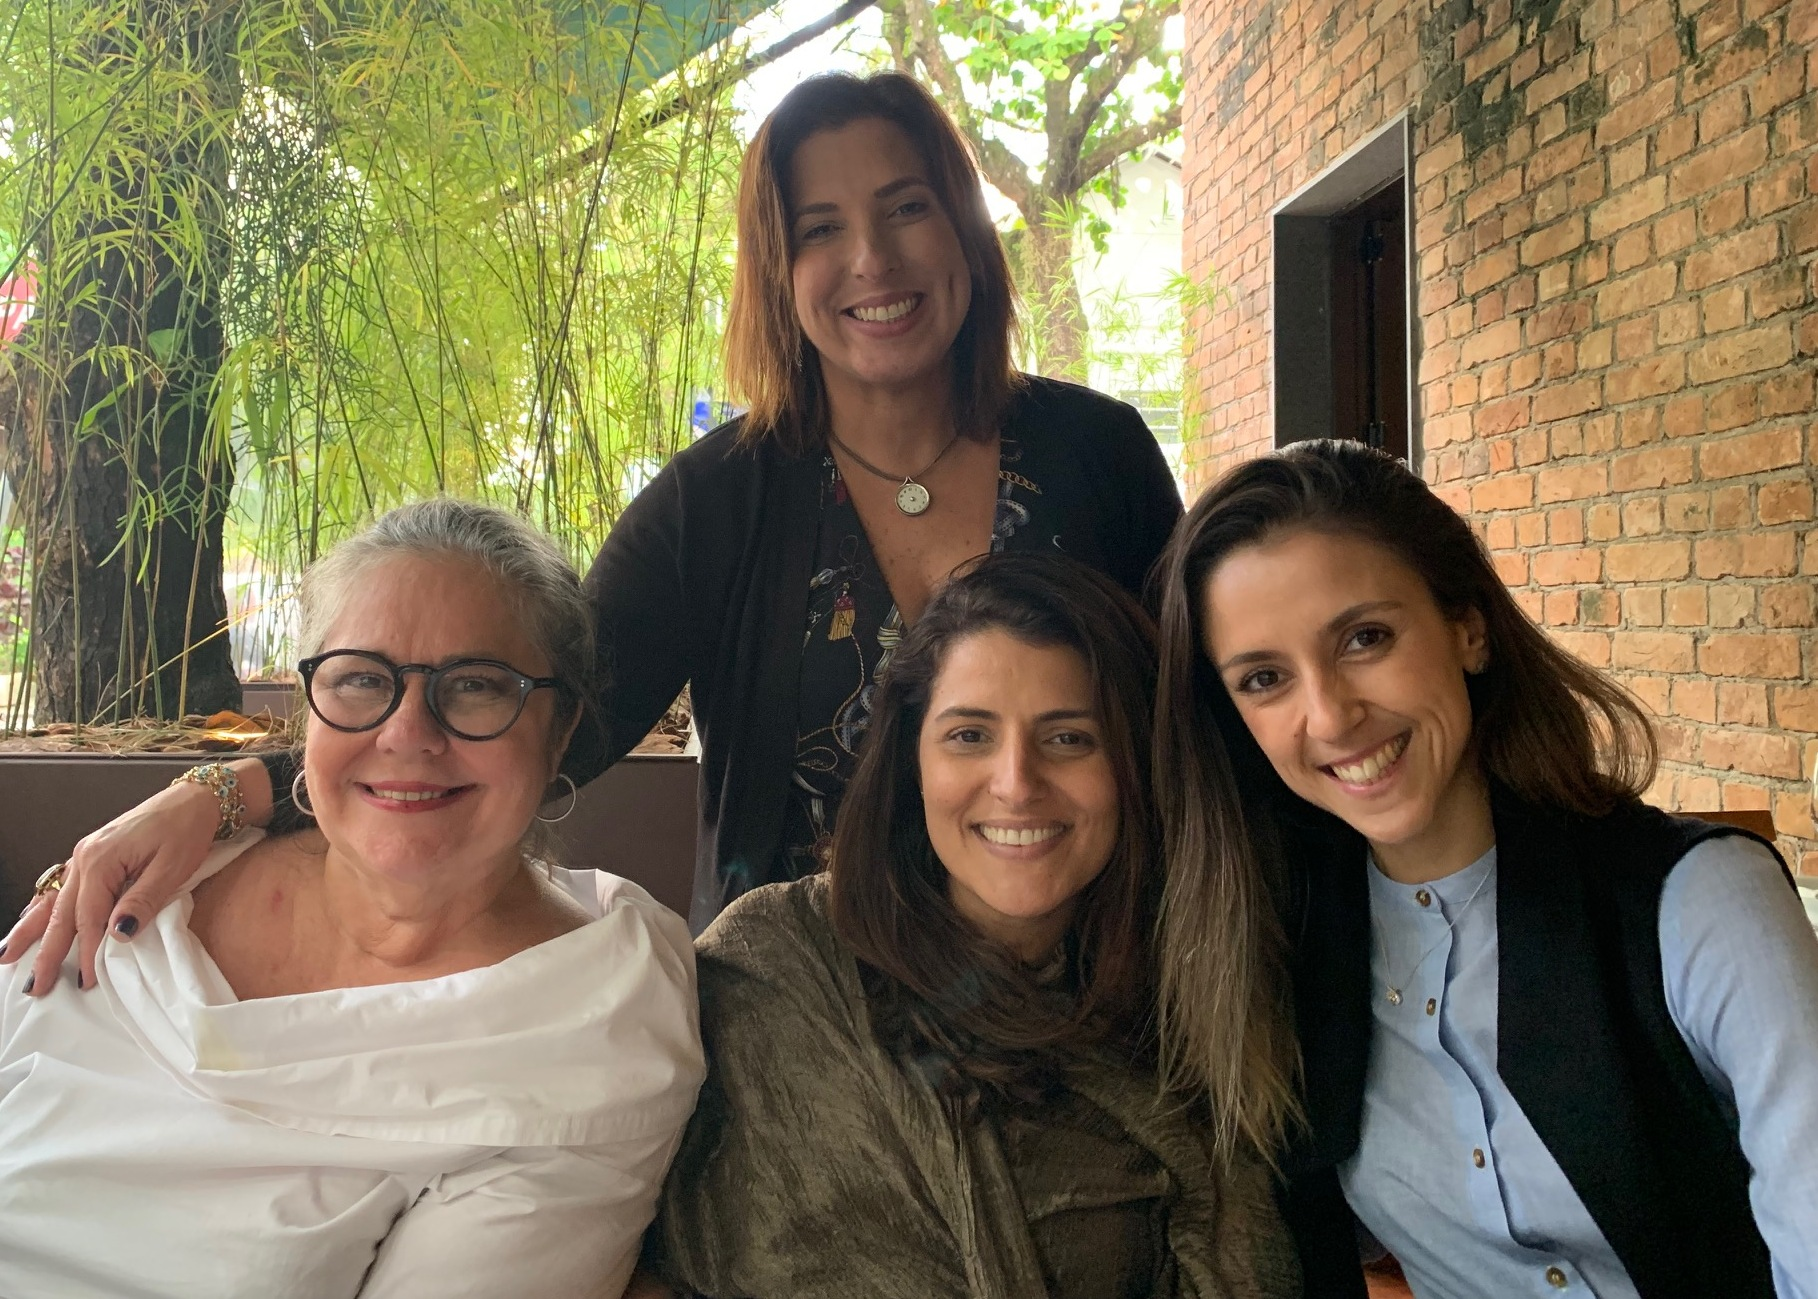 Lou Bittencourt, Renata Izaal, Maria Vargas e Malu Neves / Foto: Divulgaçâo